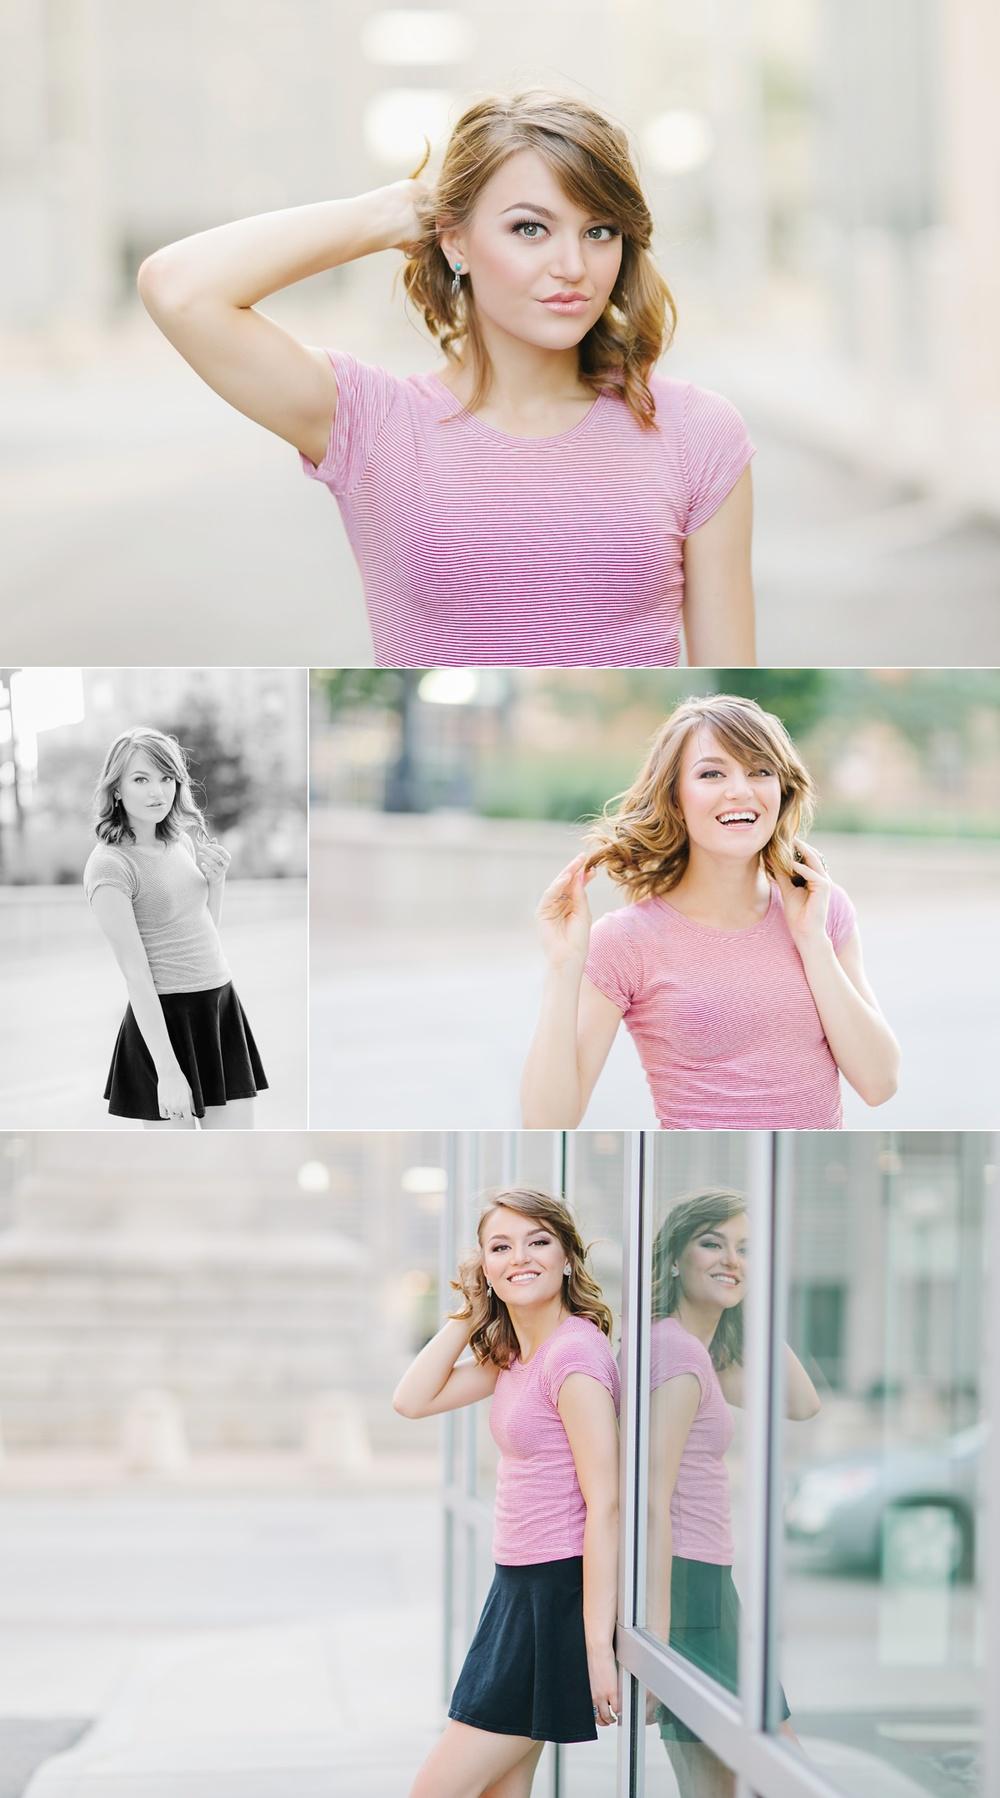 Dayton-Senior-Photography-Lux-Senior-Photography-04.jpg